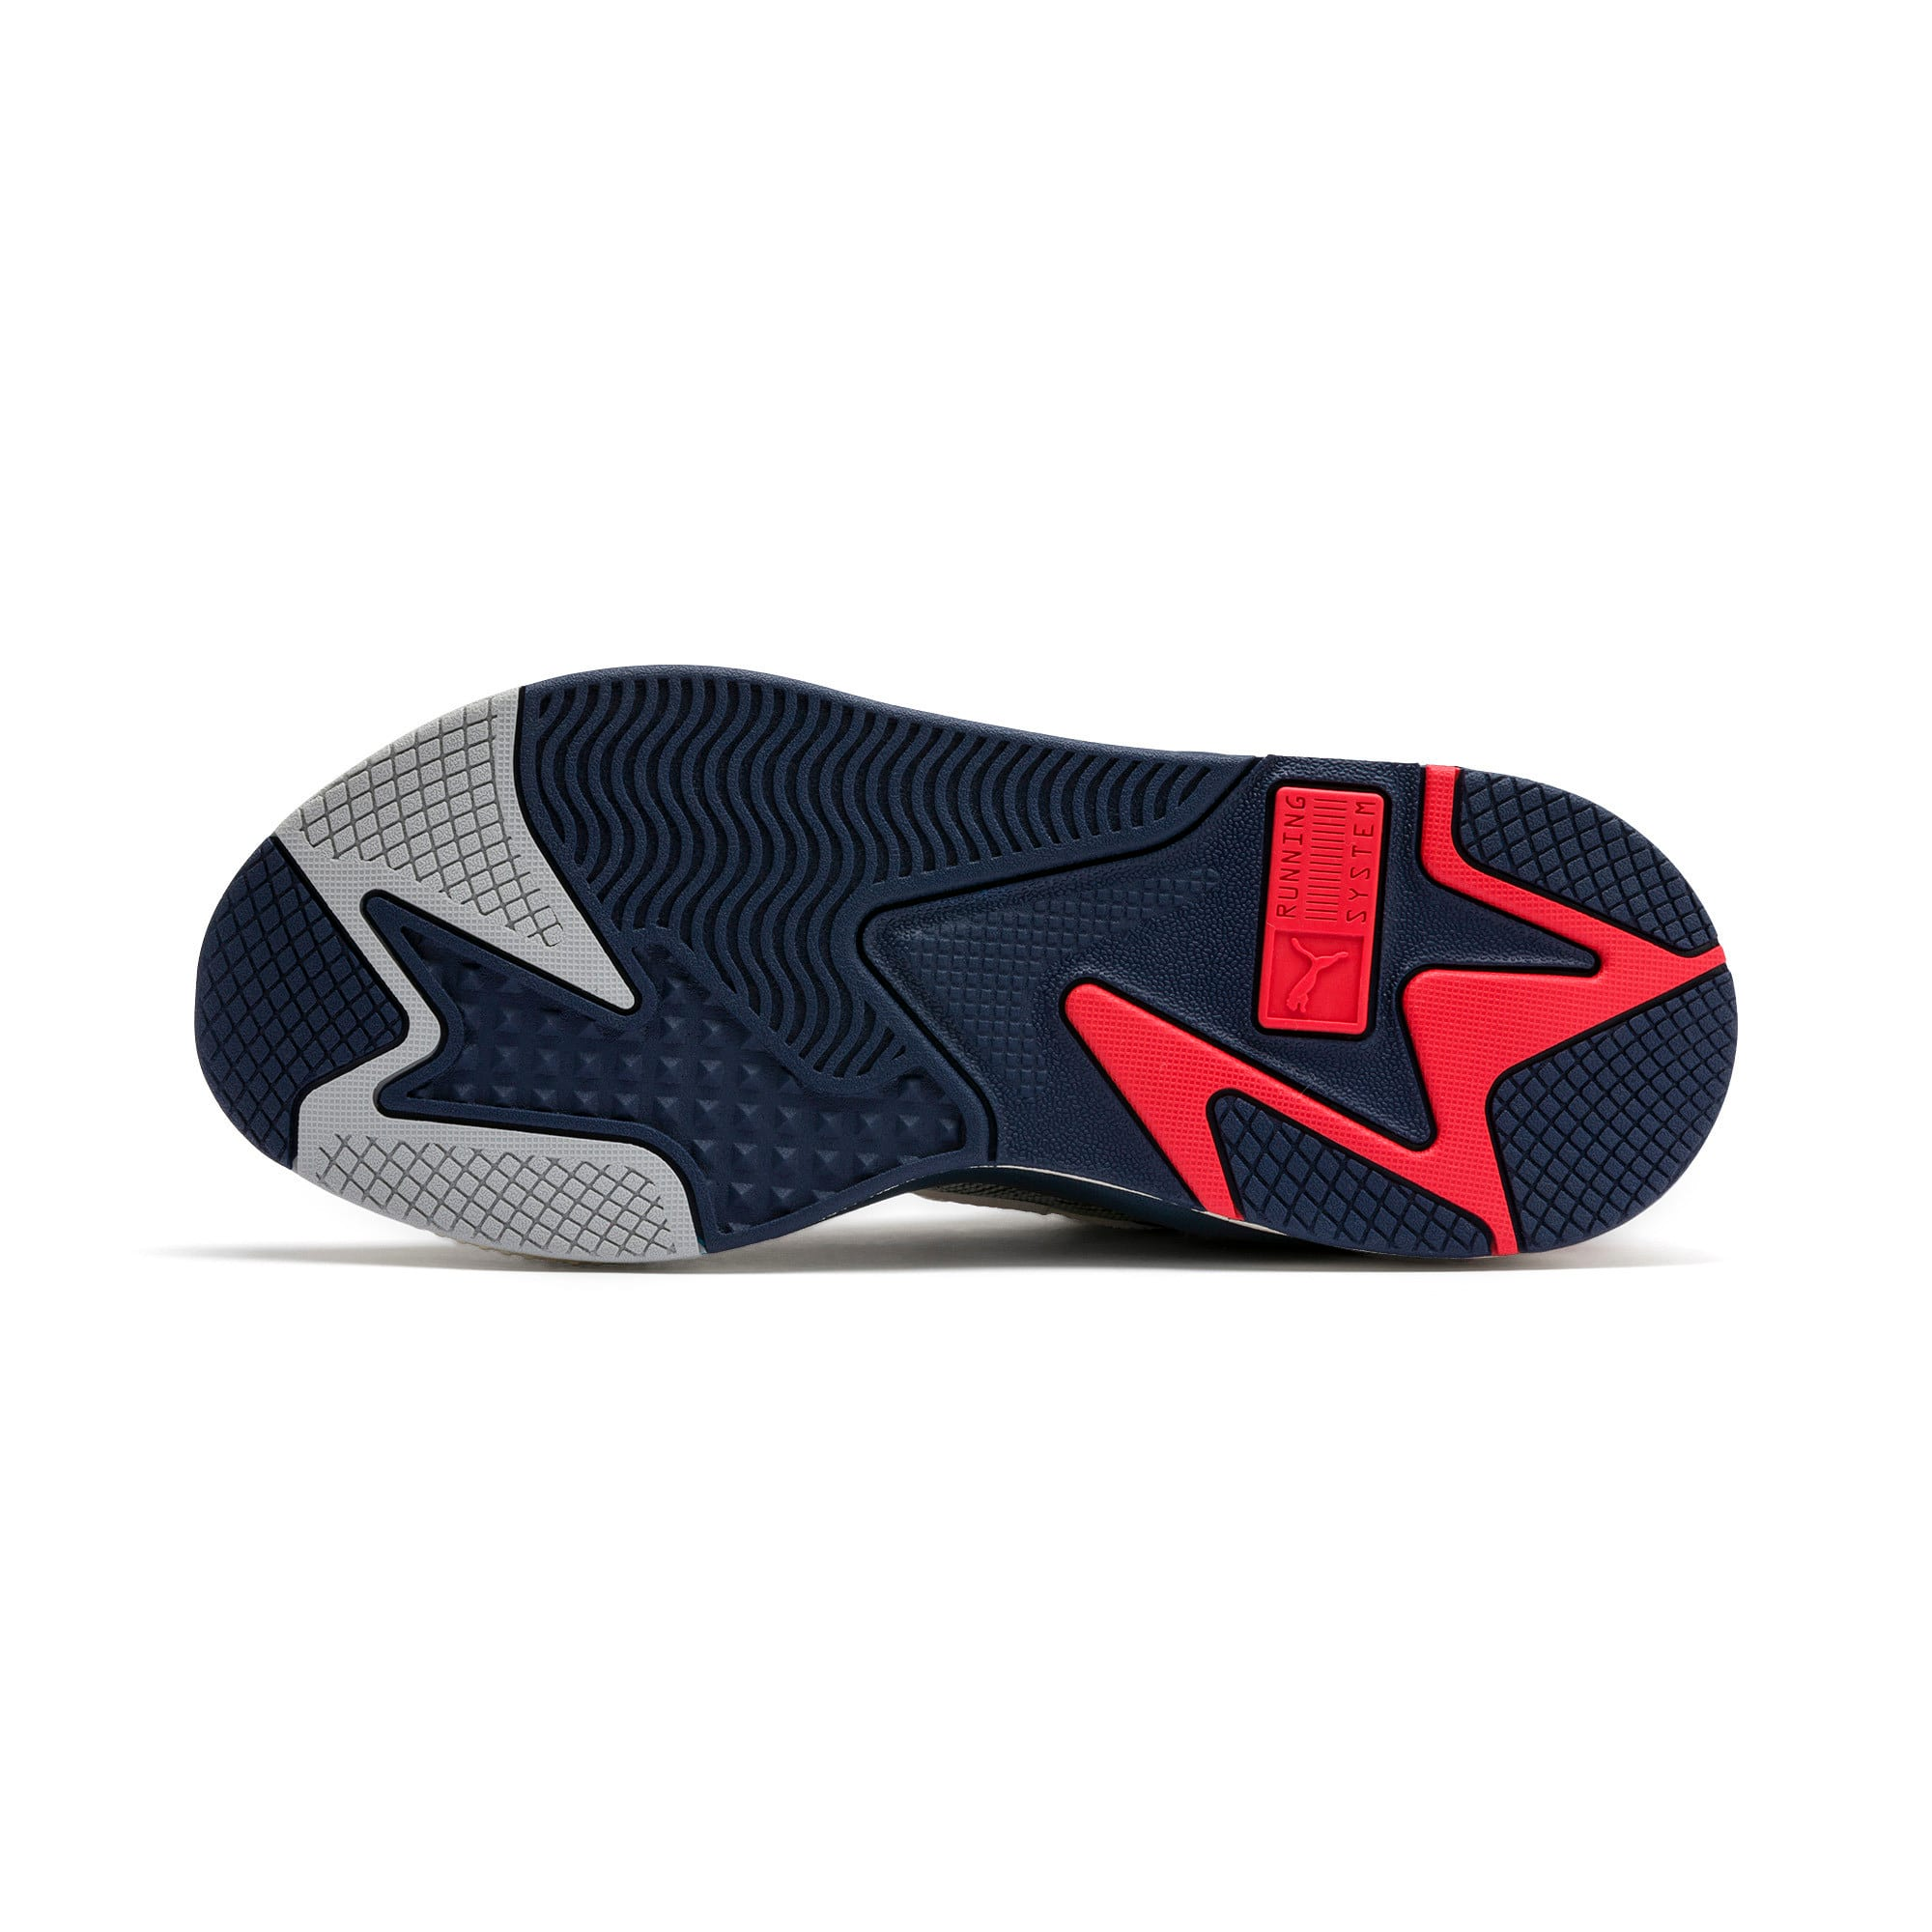 Thumbnail 5 of RS-X Hard Drive Sneaker, Whisper White-Peacoat, medium